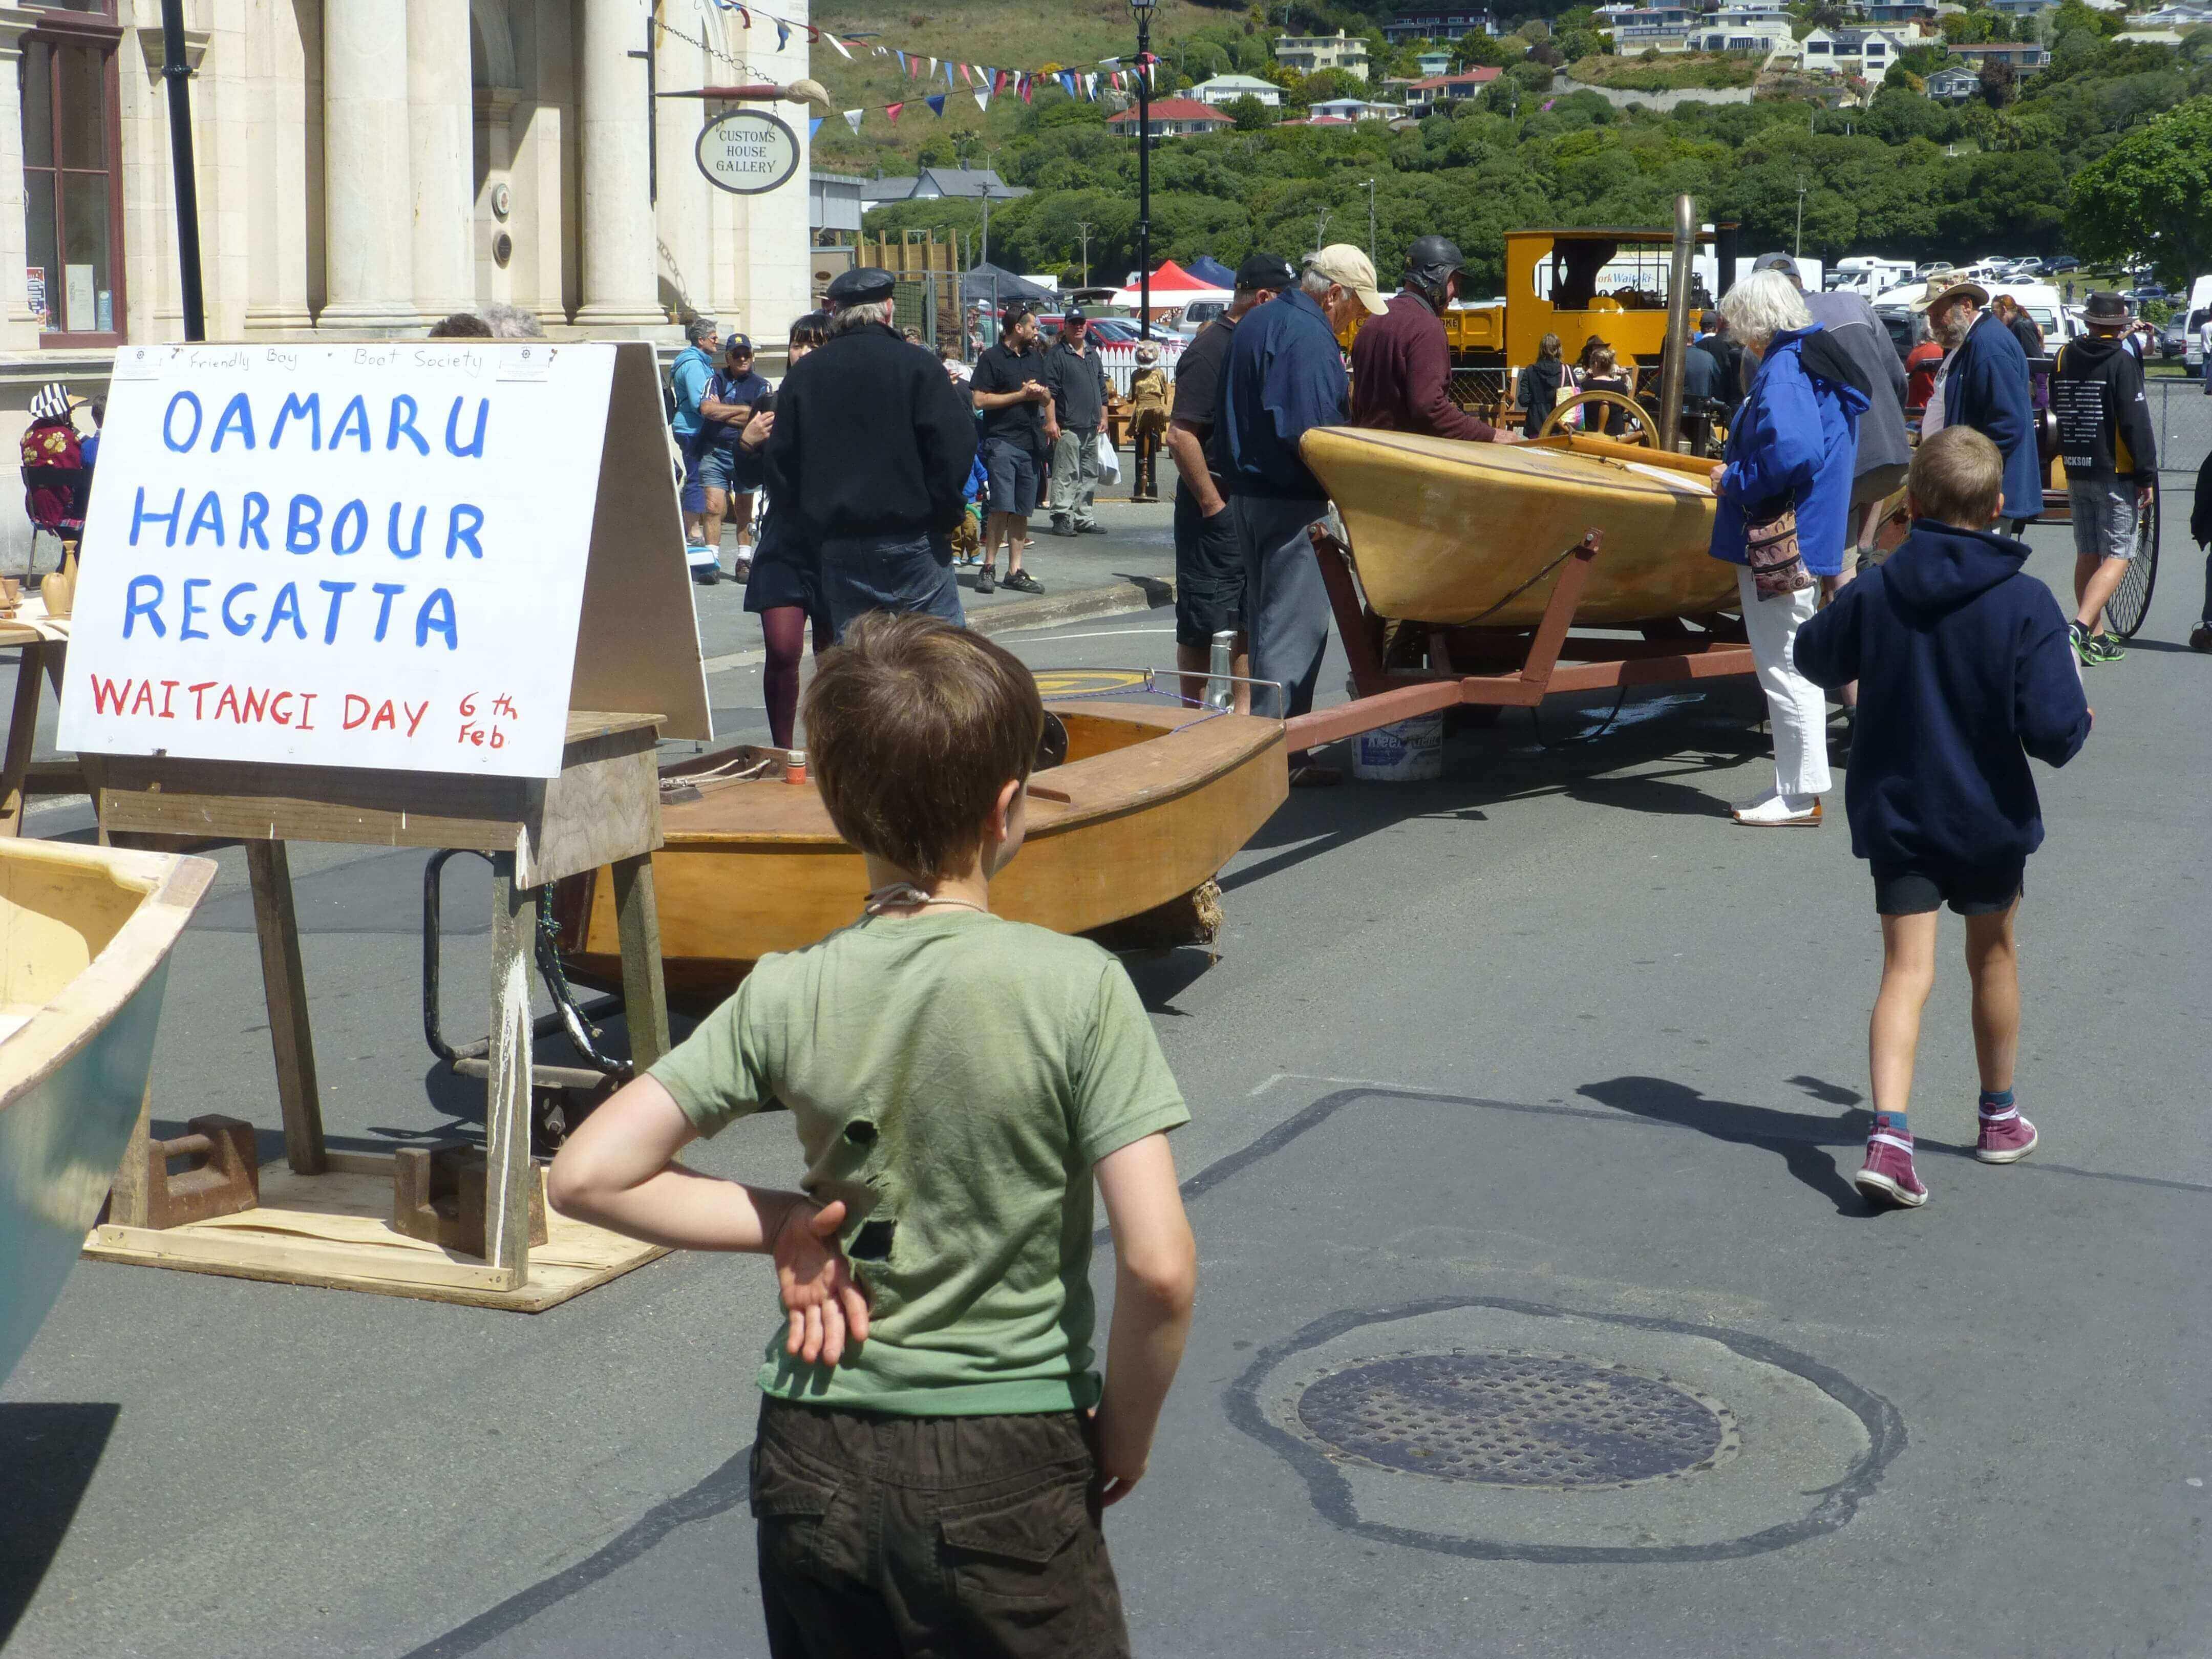 Viktorian Festival in Oamaru 44